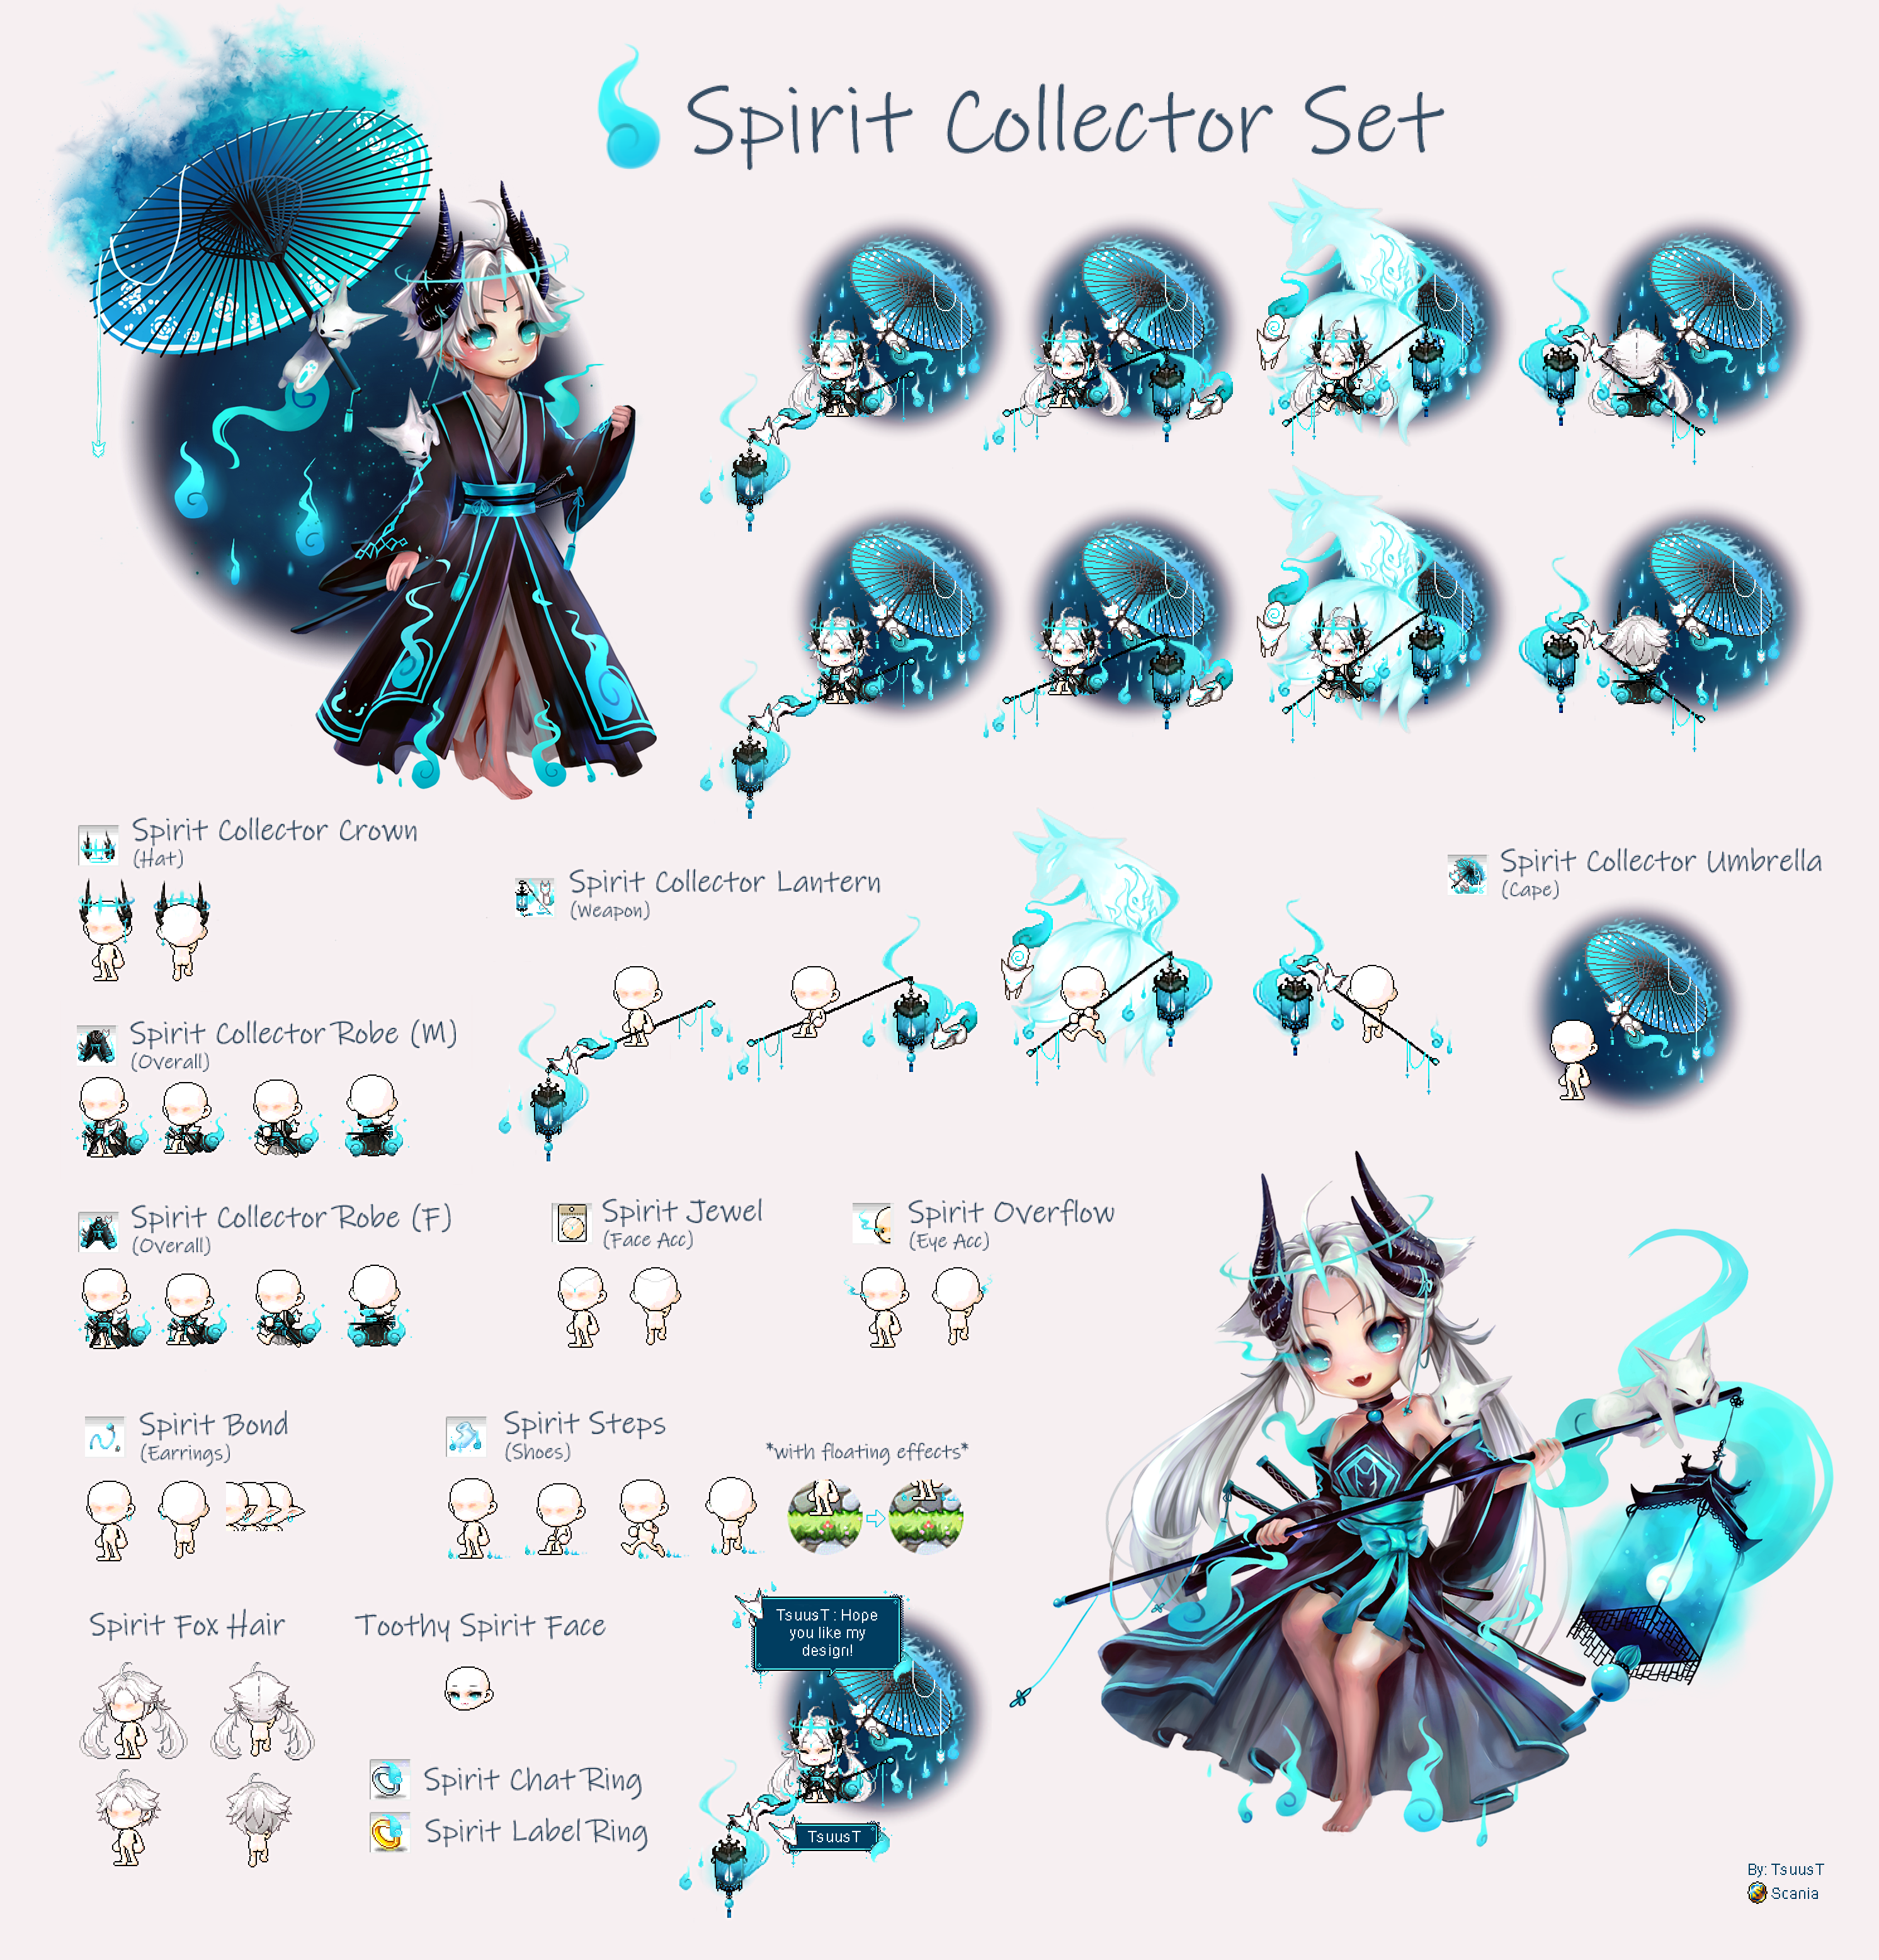 spirit_collector_tsuust_v2.png